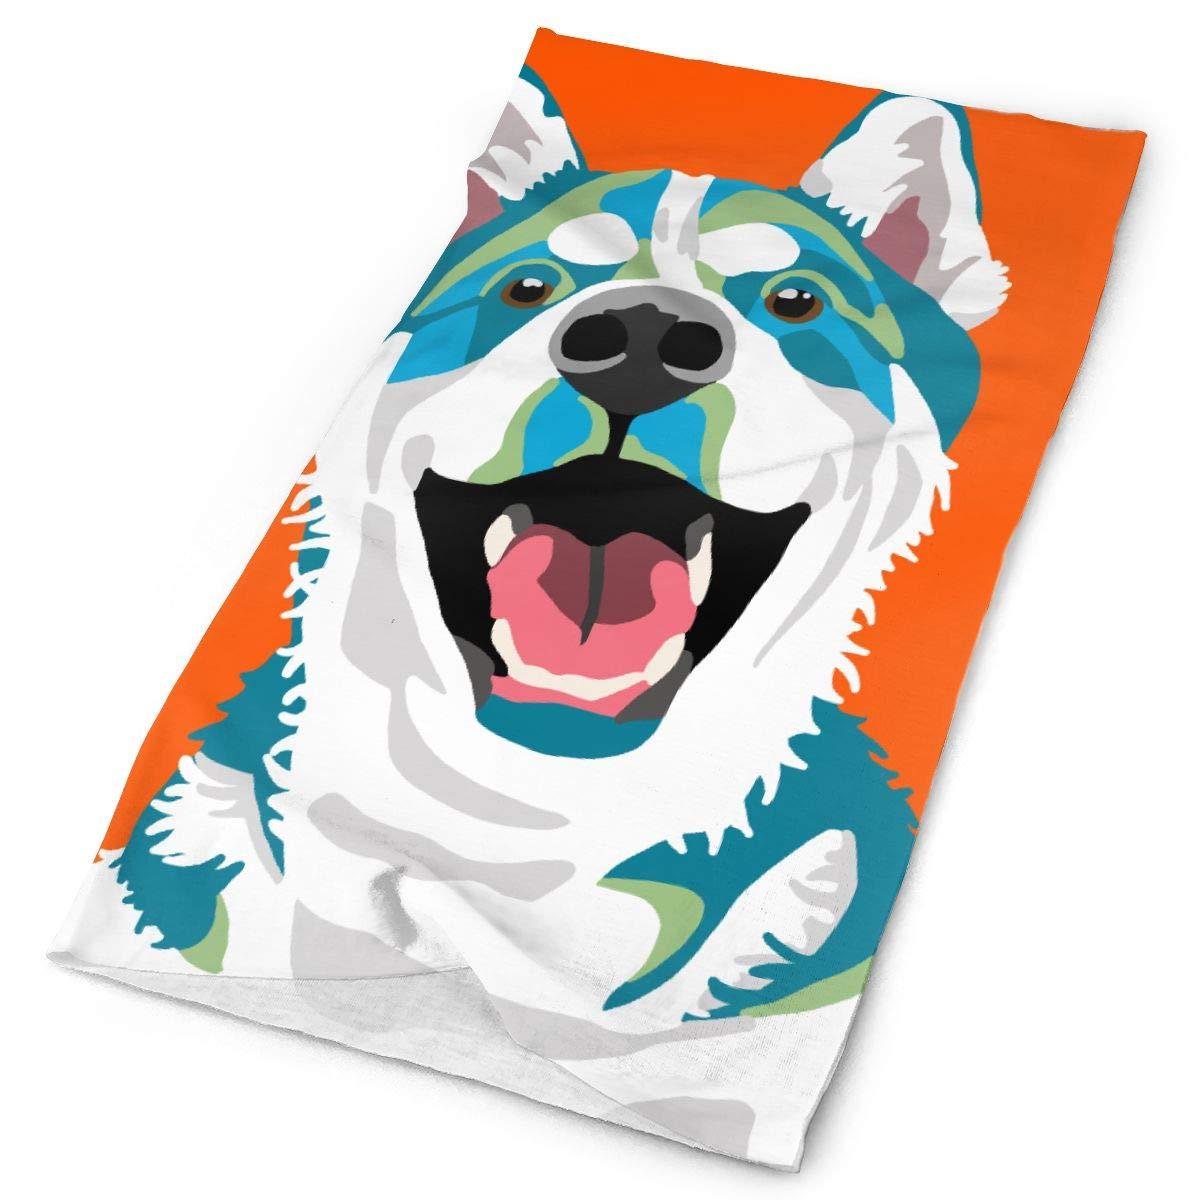 SHINYWEET las mujeres hombres Pitbull cuello de perro polaina de sombreros de cinta para la cabeza, mascara facial Bandana sin costuras 16-en-1 bufanda mágica Multi